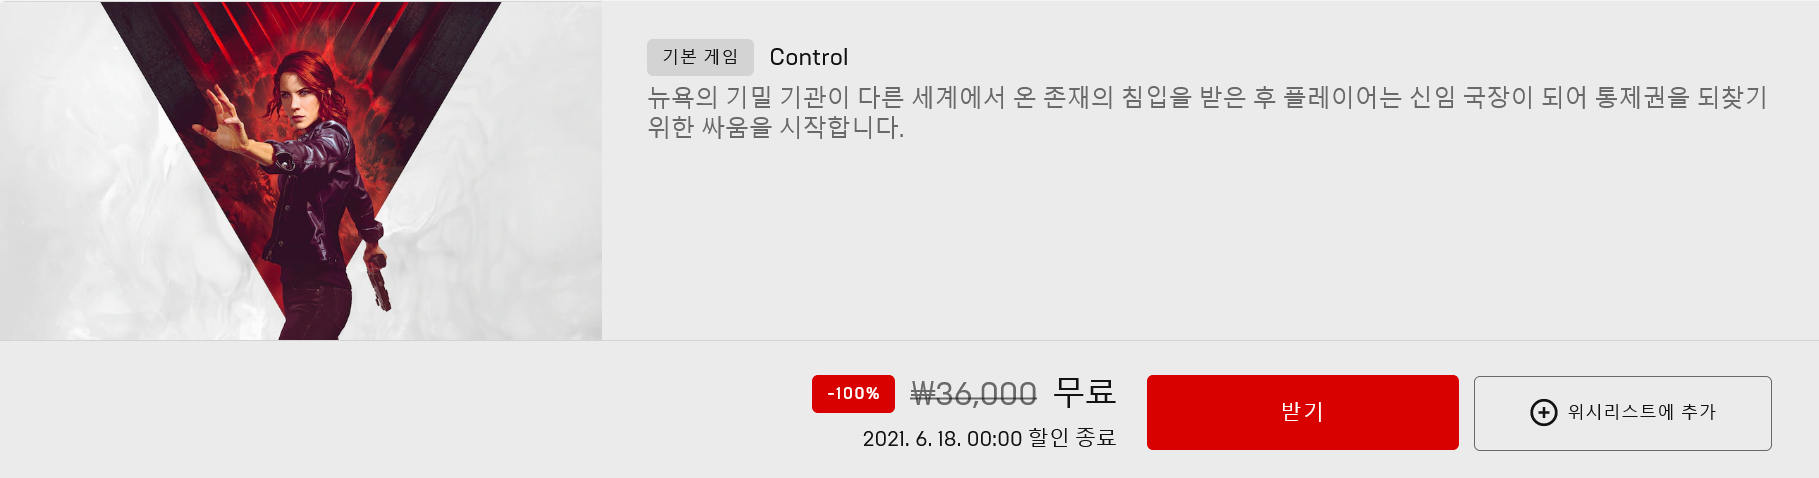 Screenshot 2021-06-11 at 00-00-42 Control 오늘 다운로드 및 구매 - Epic Games Store.png